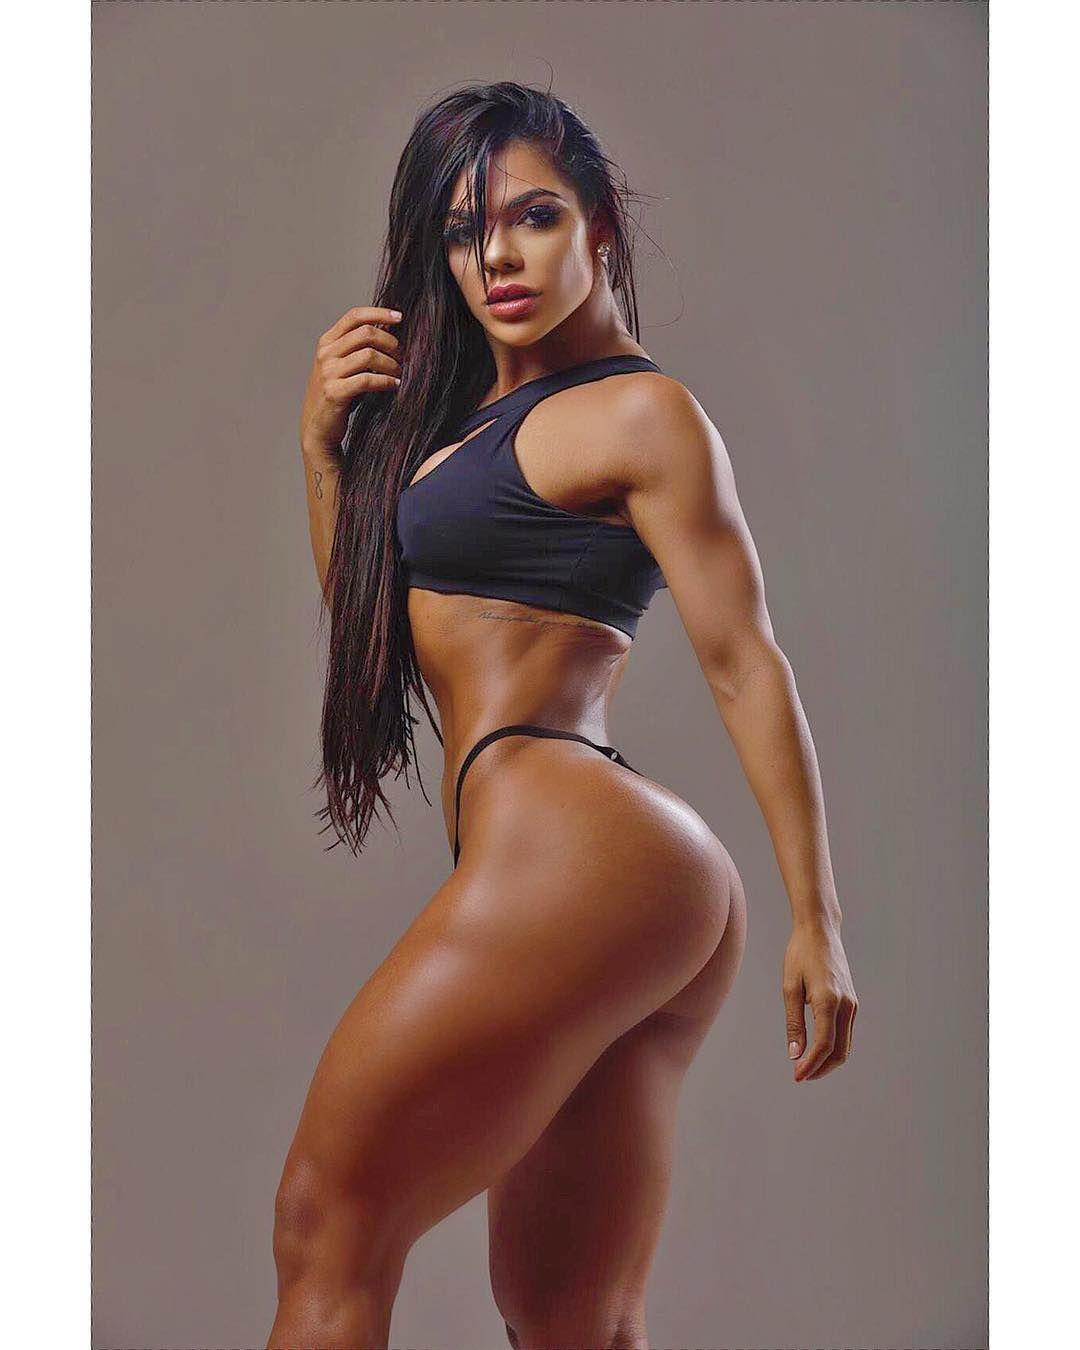 Susi Hotride - Model page